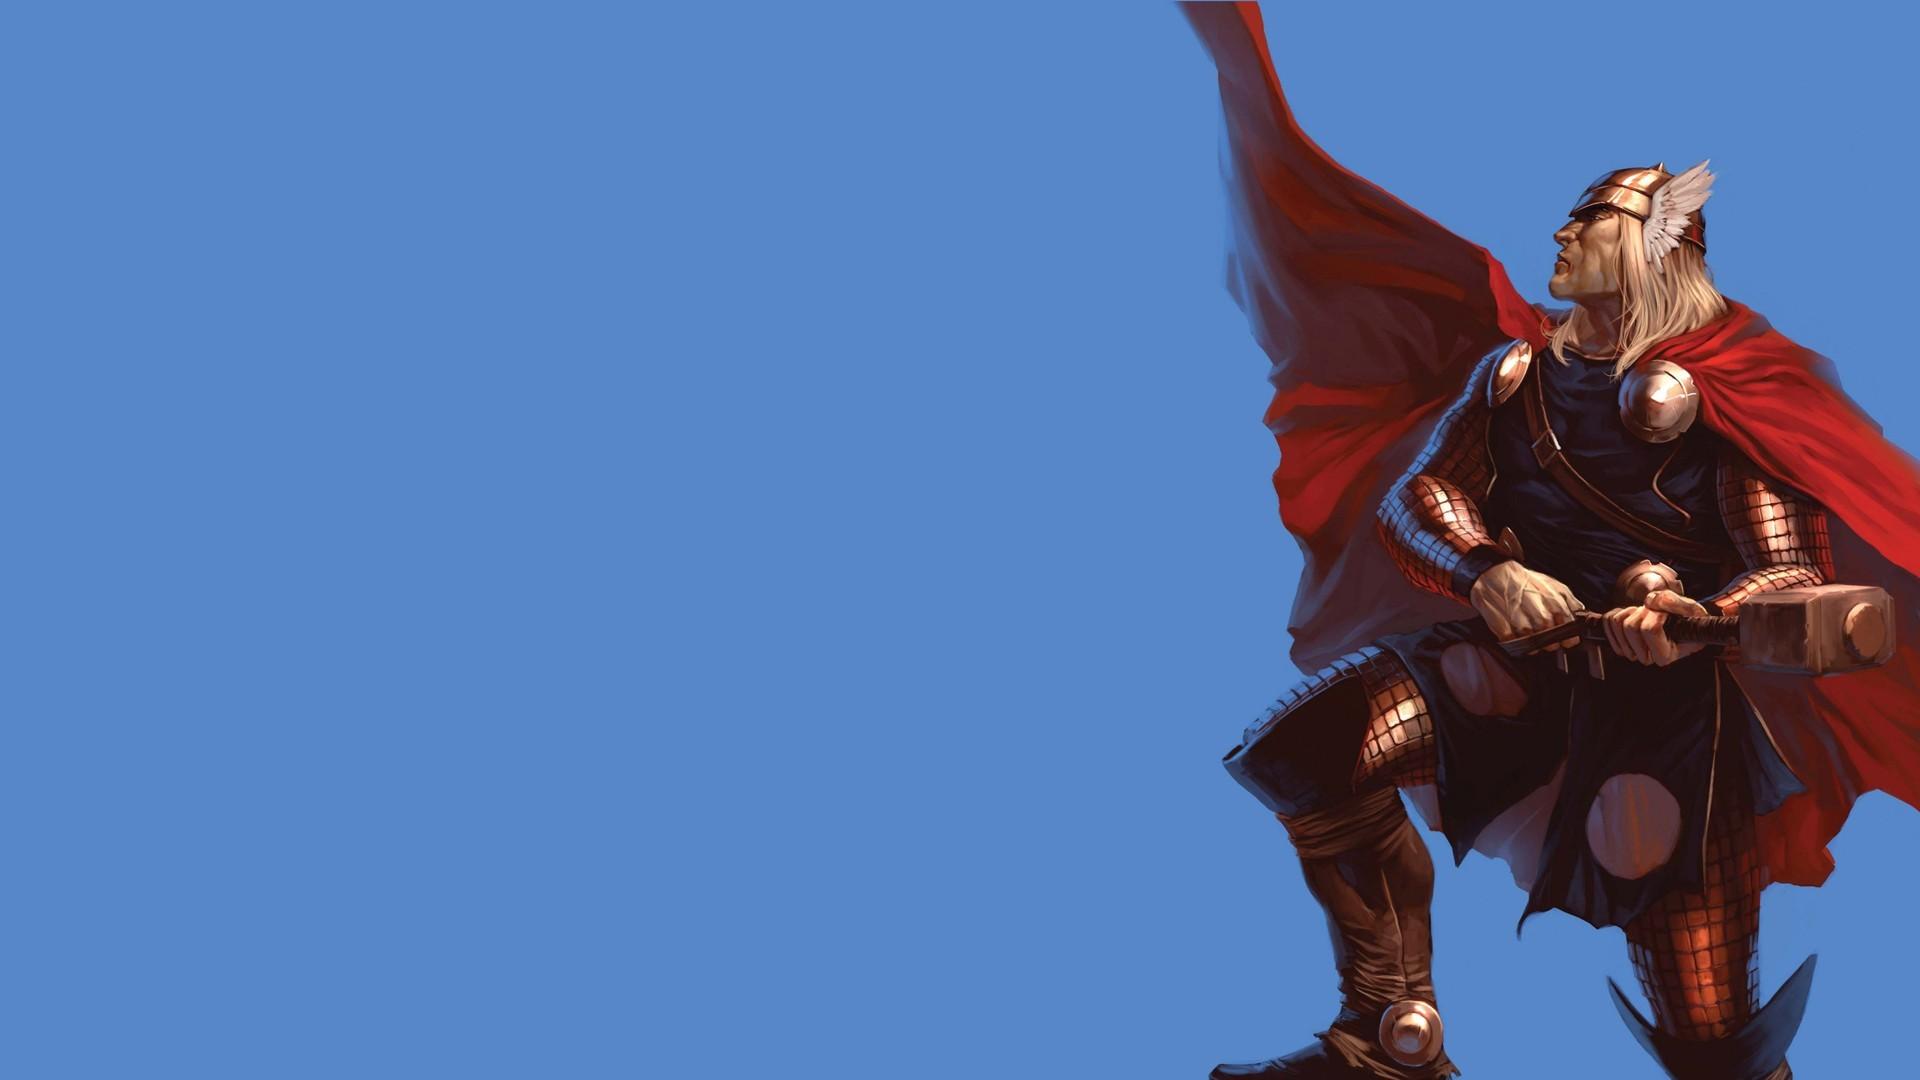 Thor Hammer Iphone Wallpaper   Info